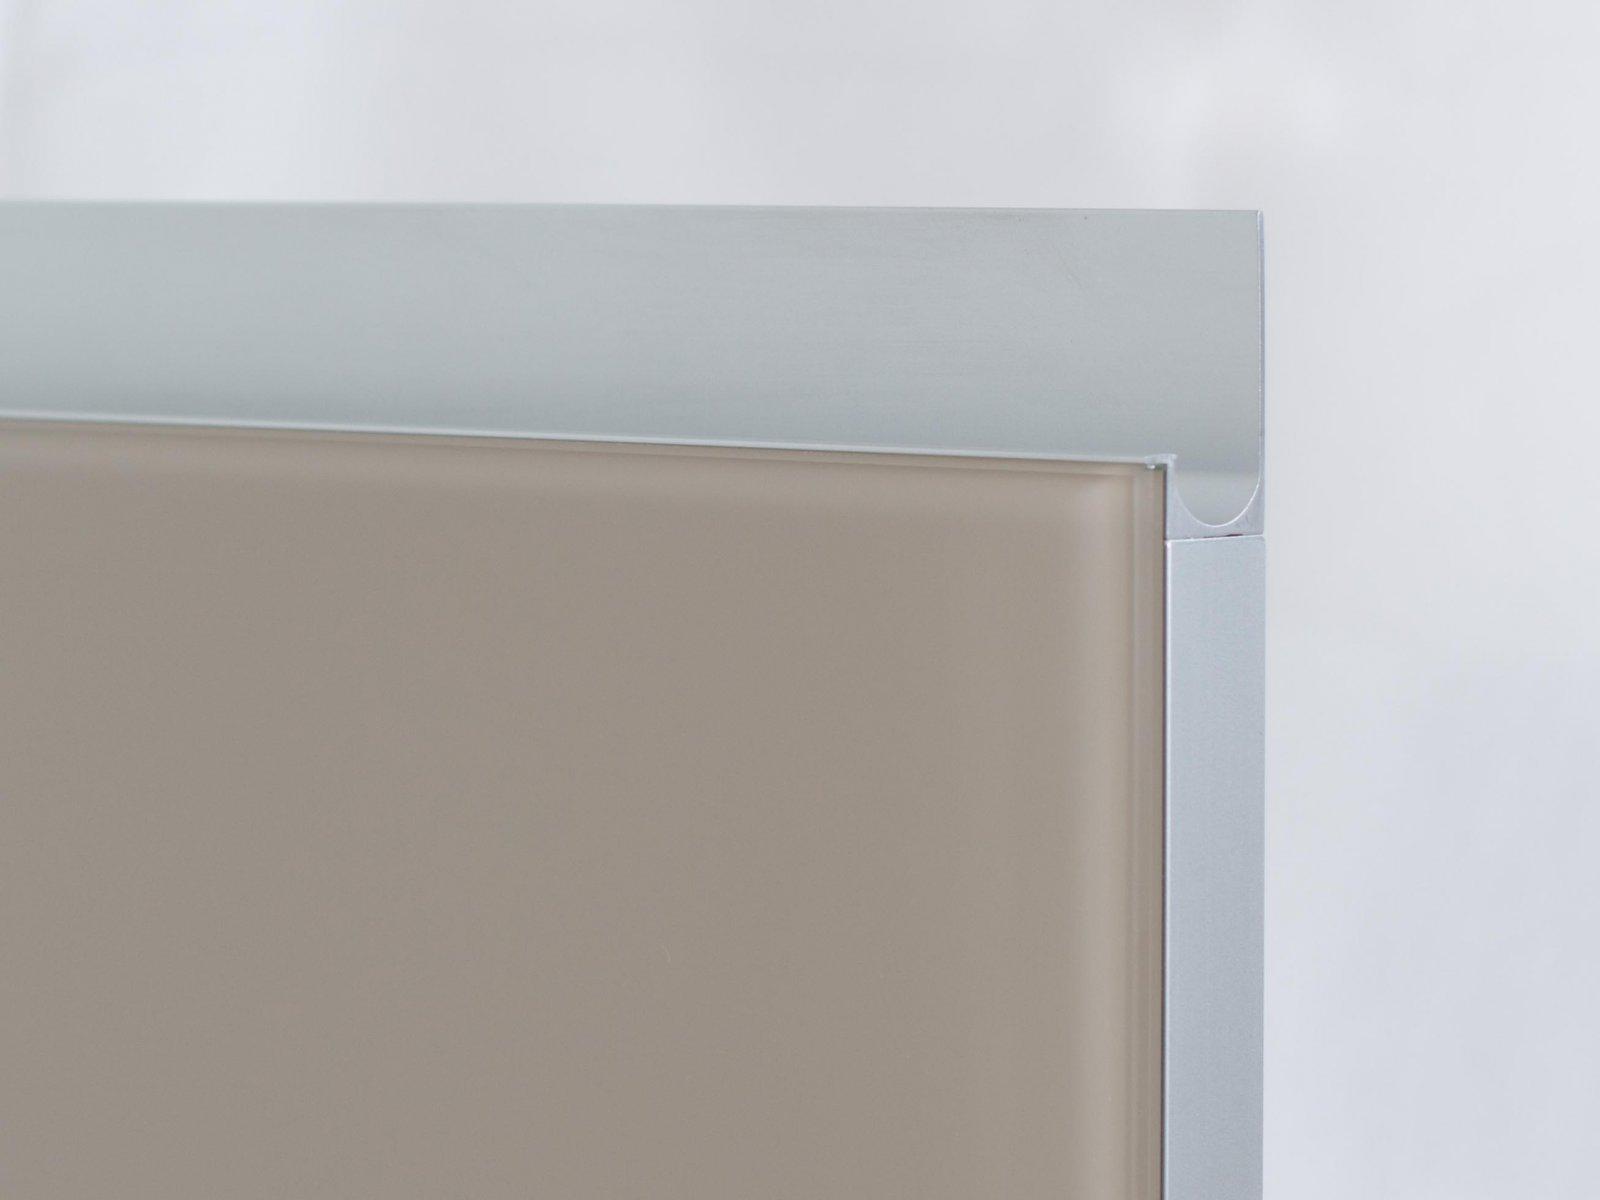 Porta-7 (Perfil V08 mate + puxador P06 mate + vidro lacado moca)